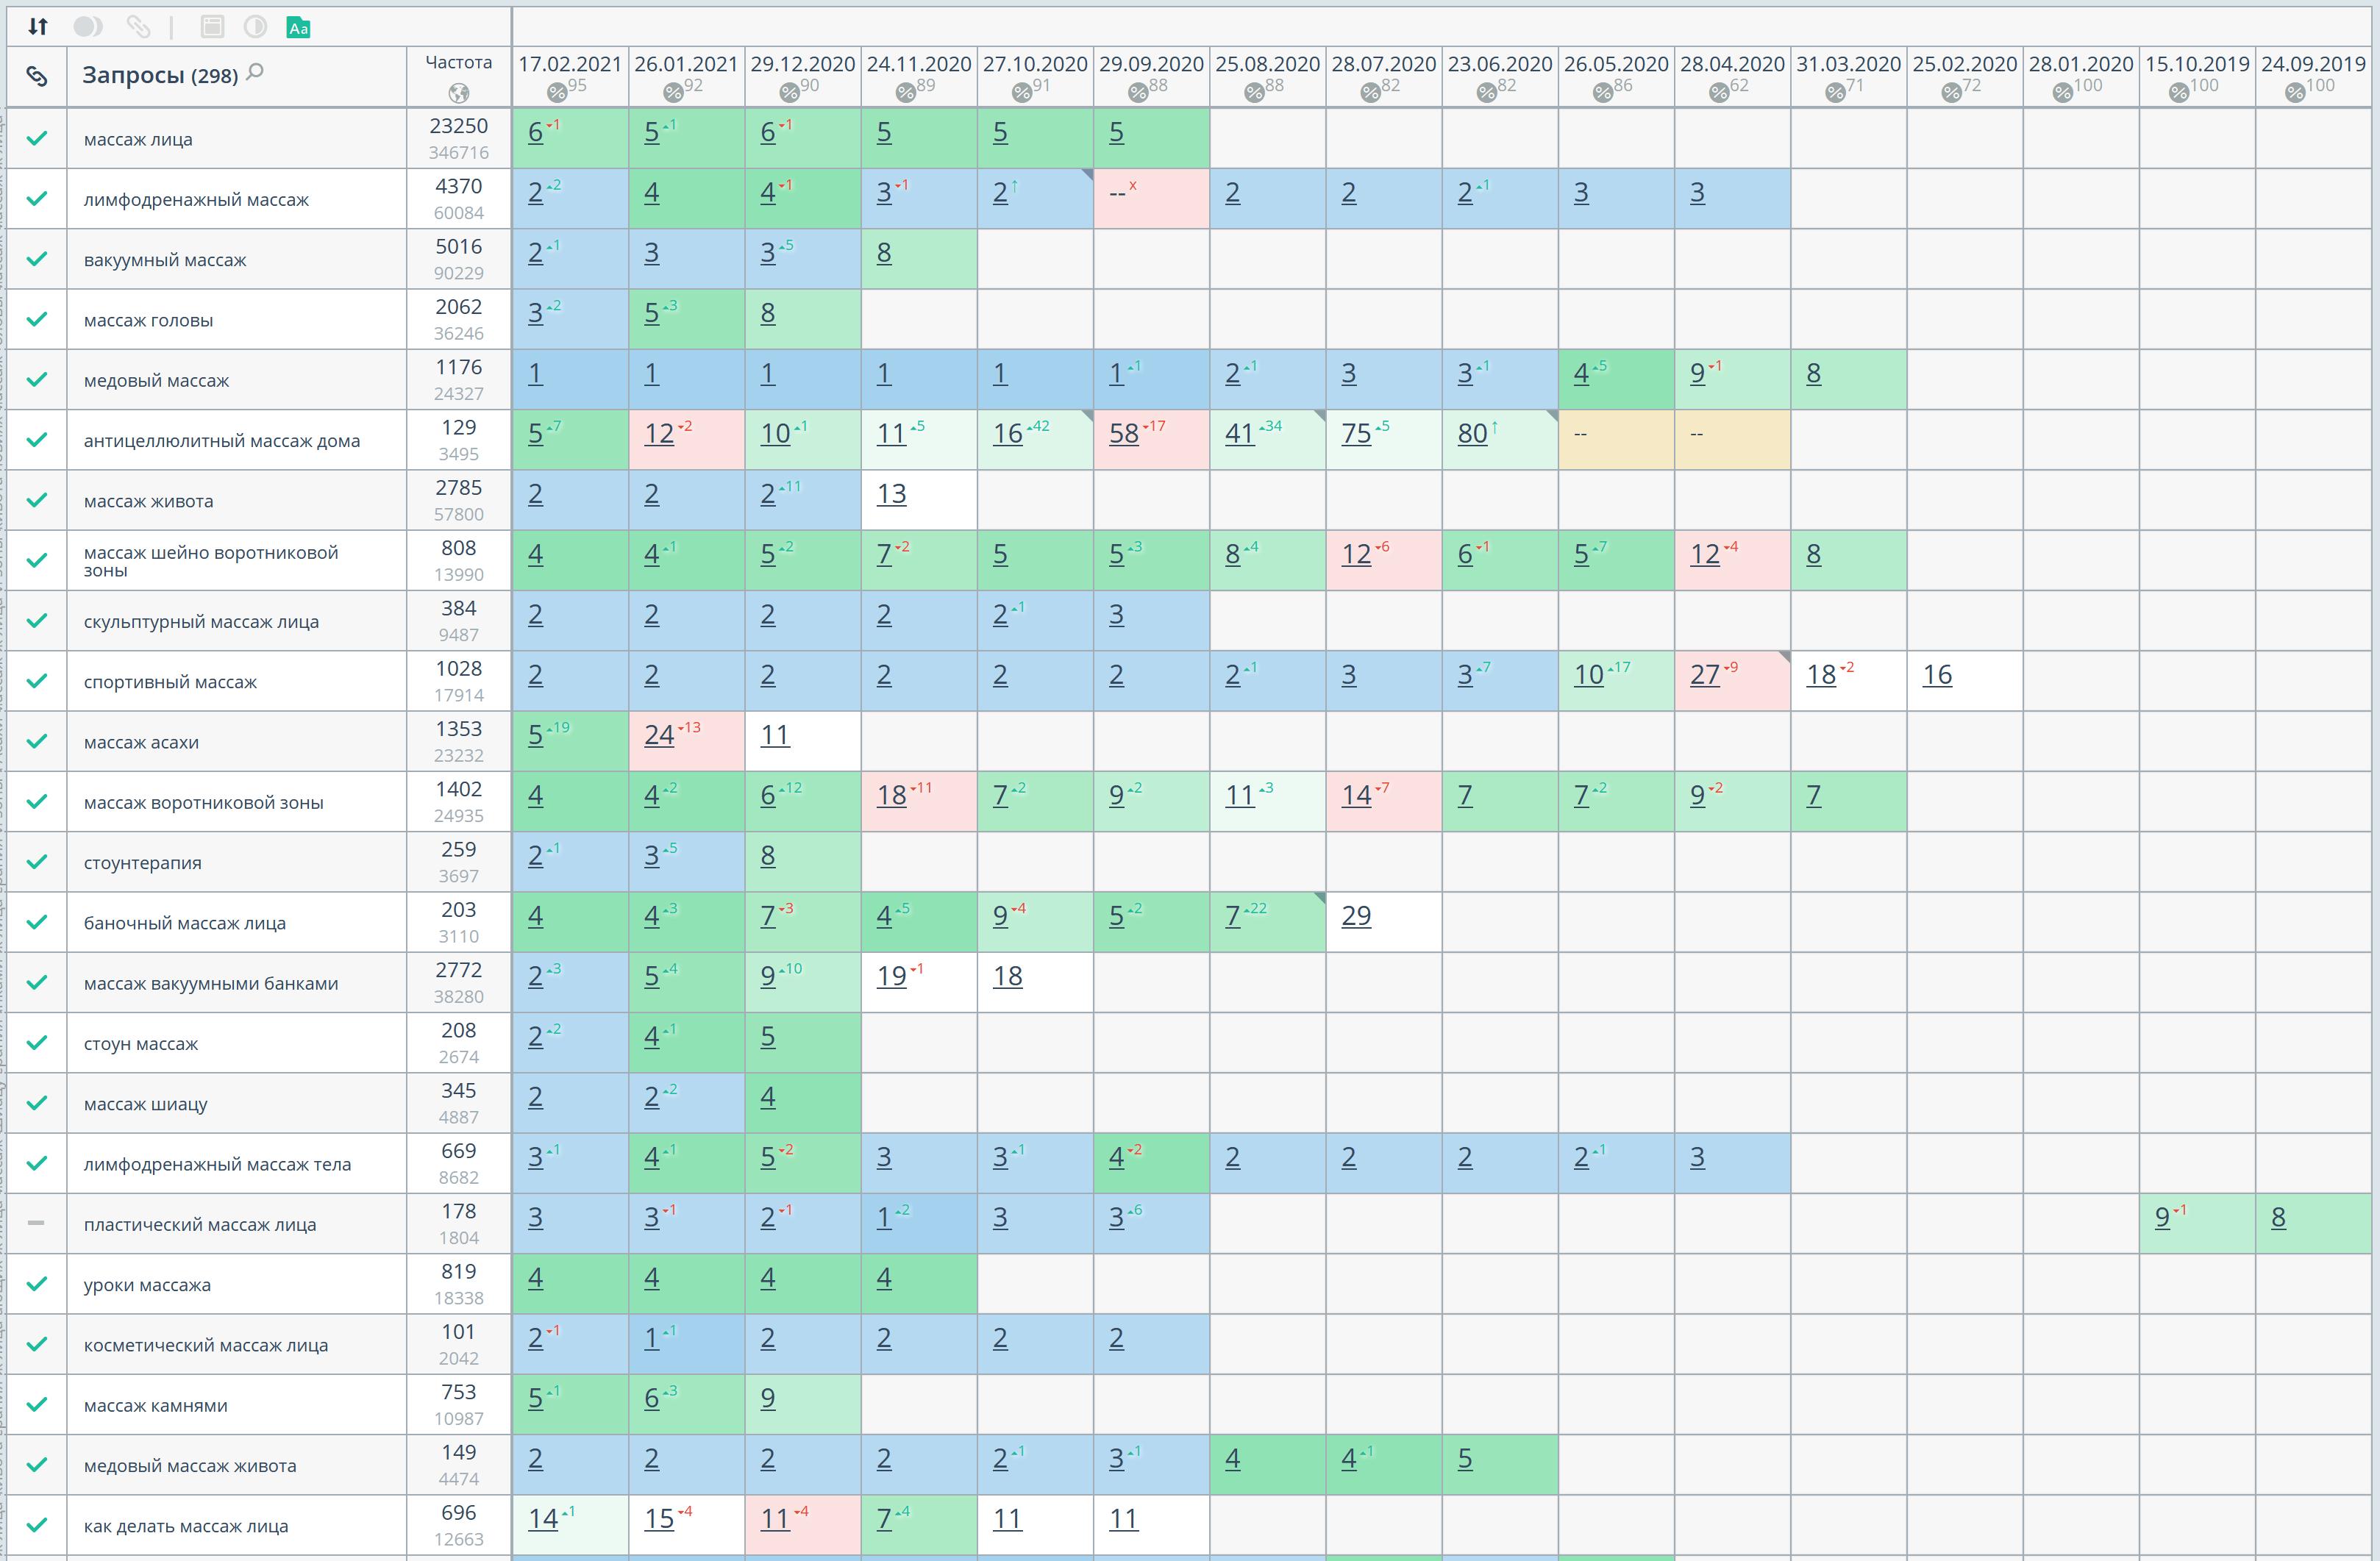 Общая статистика позиций по Google, регион Санкт-Петербург